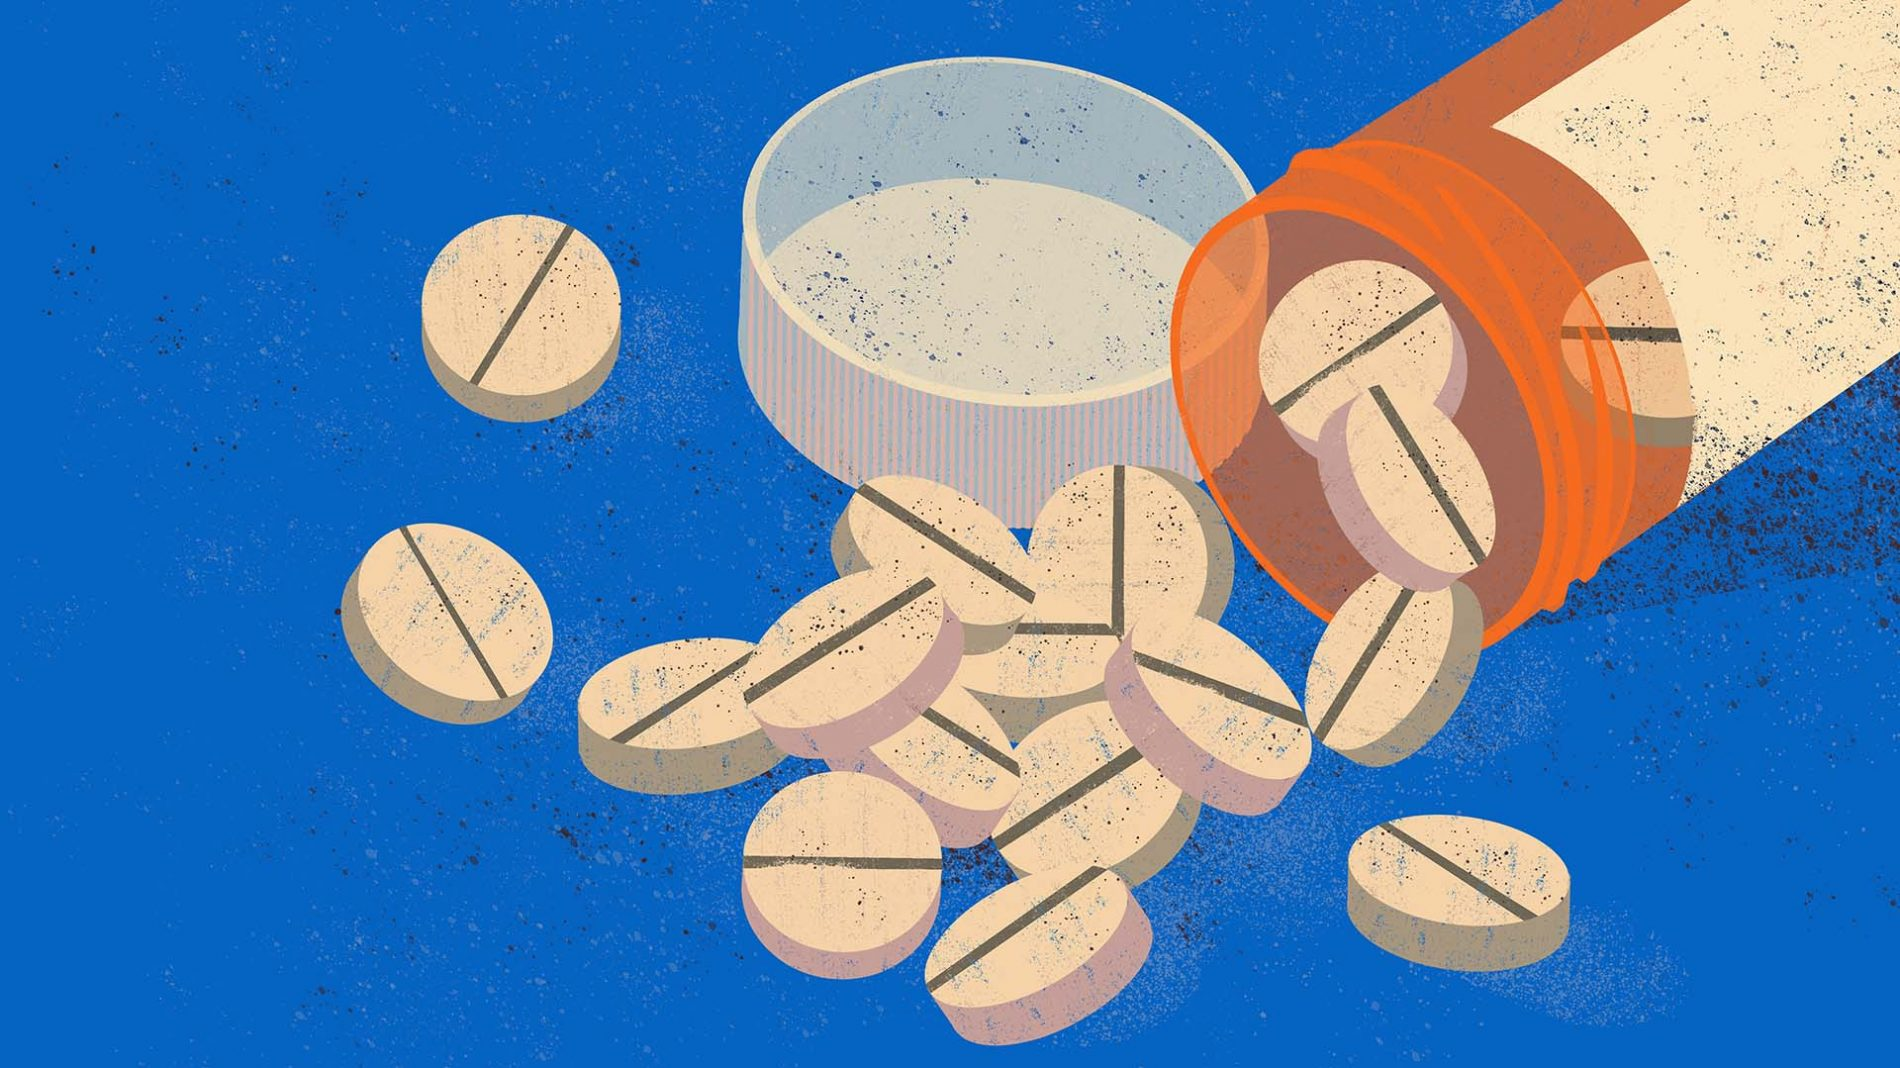 A prescription medication bottle with pills spilling out